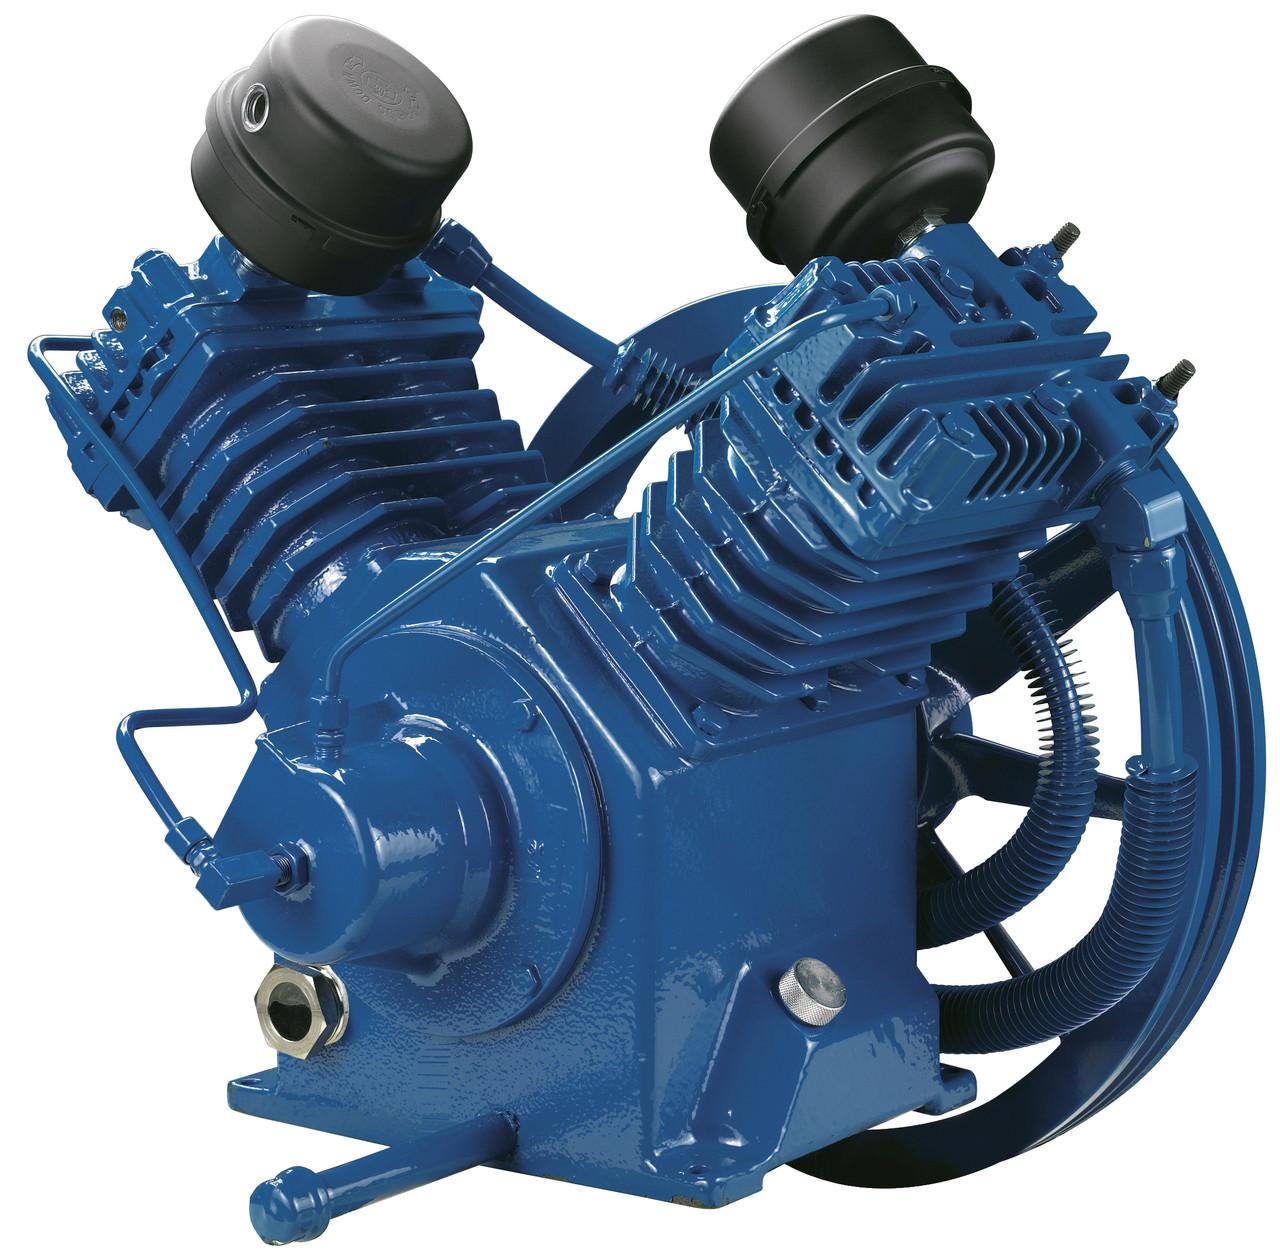 Jenny 3 5 Hp Two Stage W Air Compressor Pump